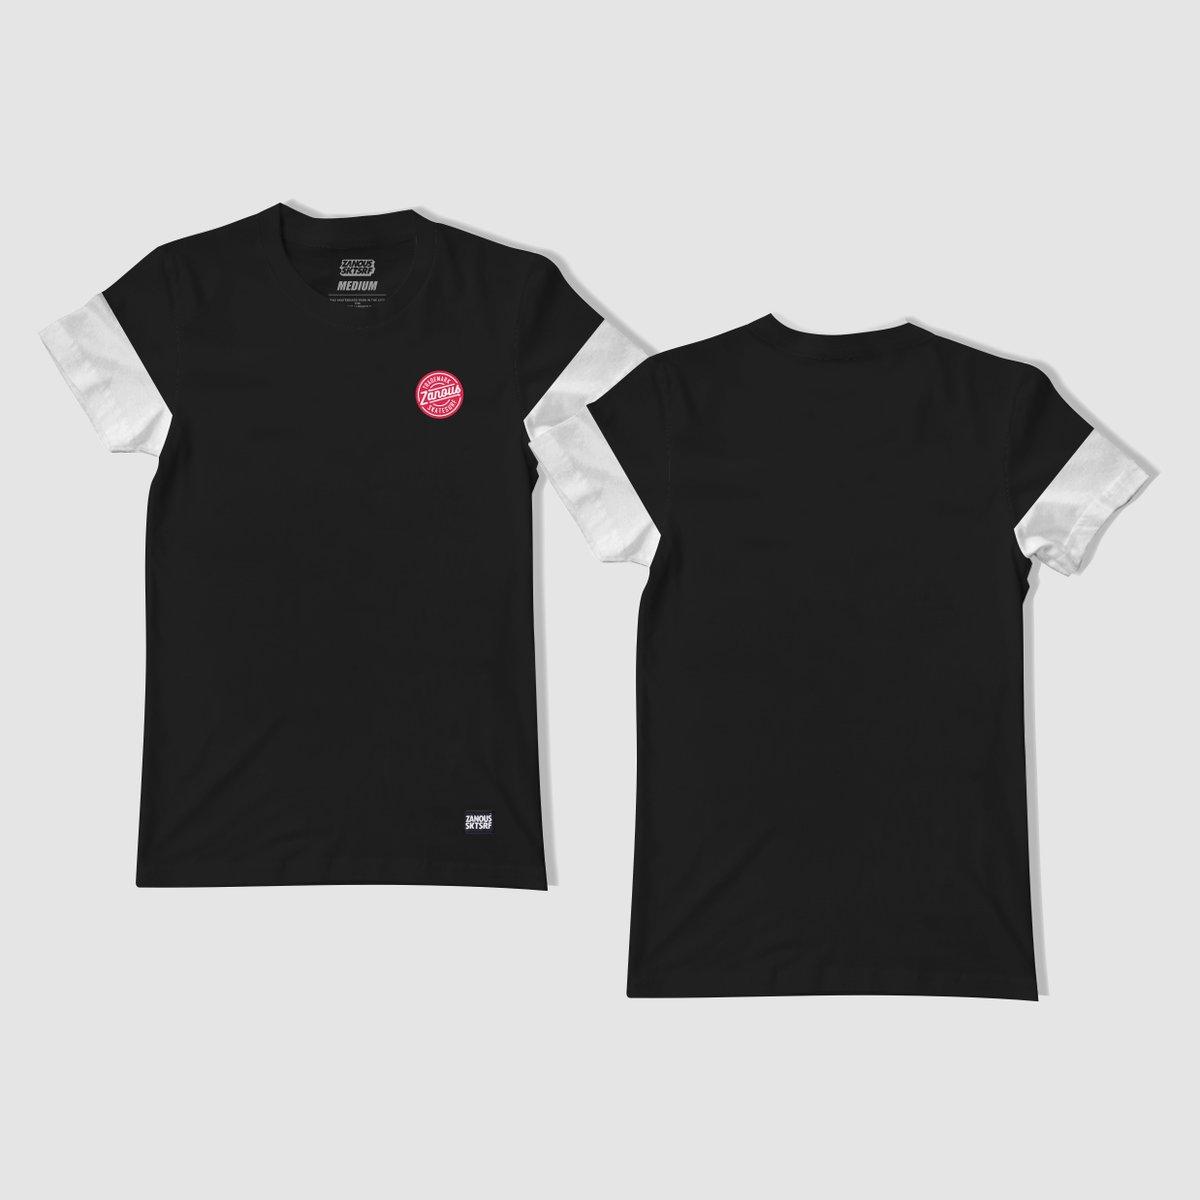 T-Shirt. Material : Cotton 30s Price : 125.000 . For order please contact : Wa : 082214180880 Shopee : Zuldazanous #zanousgangs #distrobandung #fashion #ootd #pants #skate #surf #jakarta #makasar #jepara #kuduspic.twitter.com/x0z8362ihF